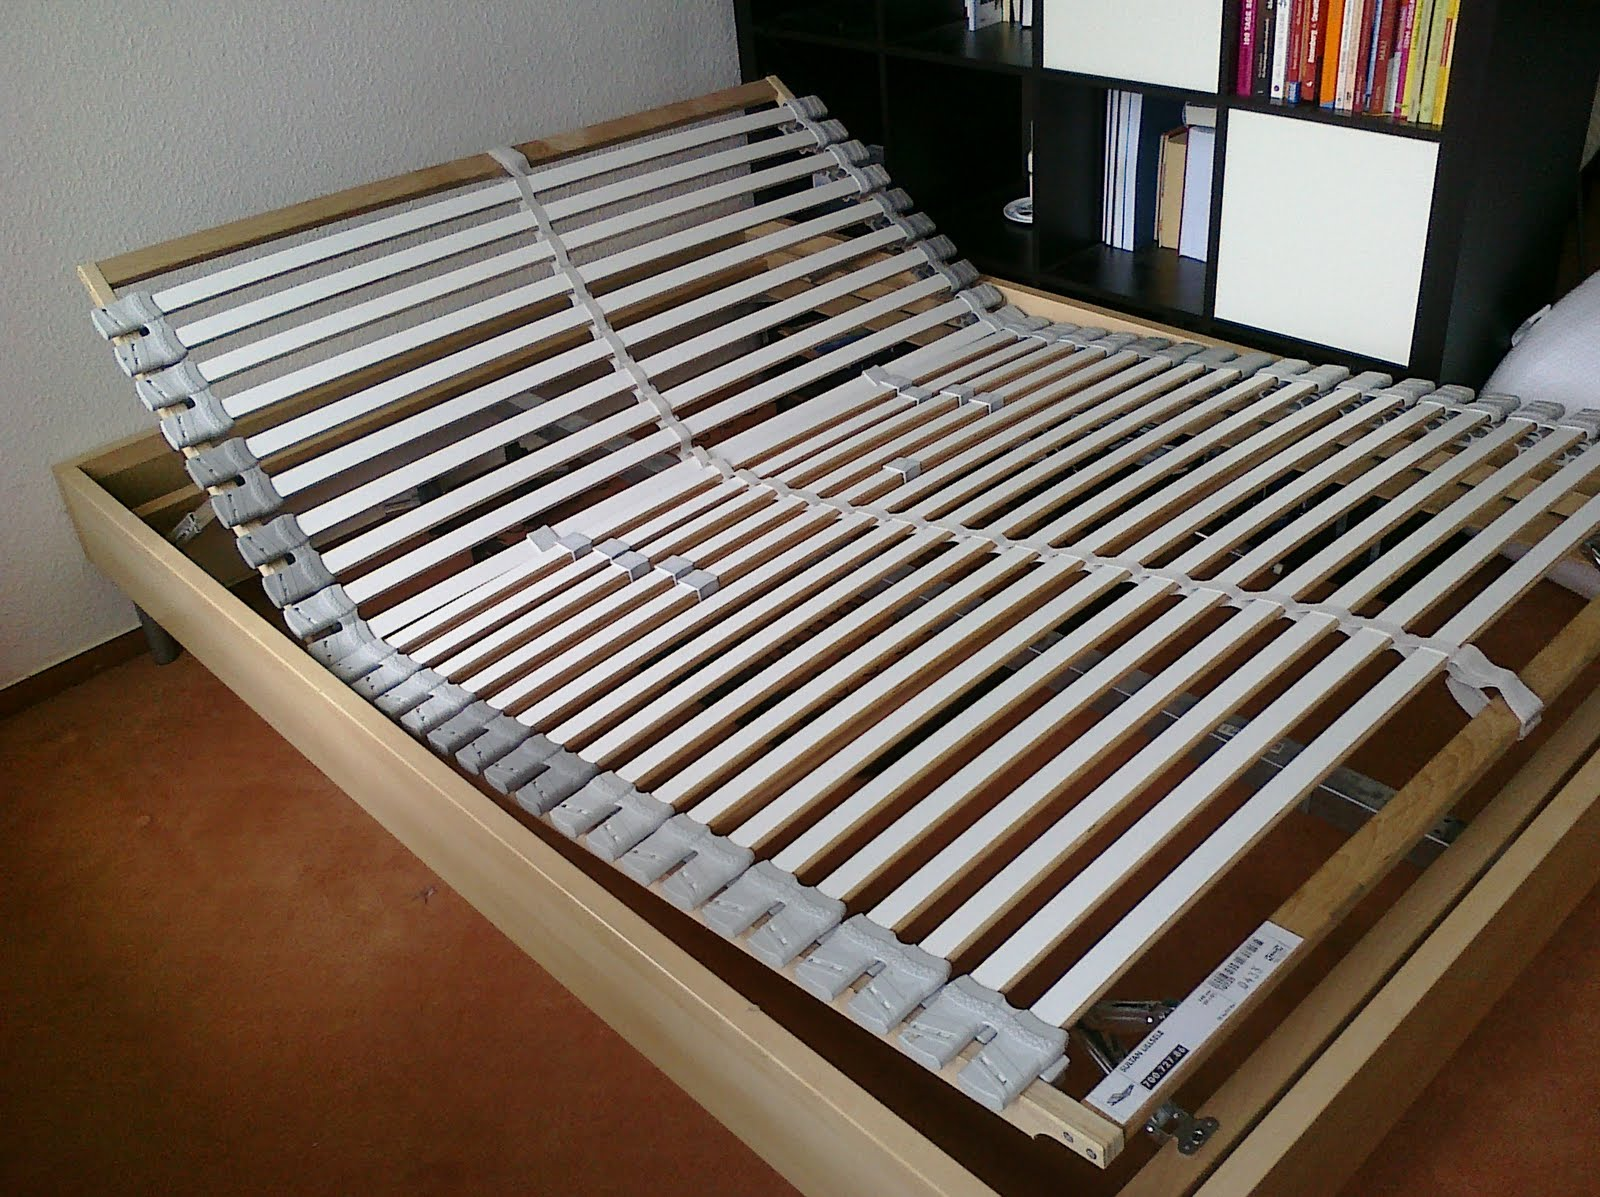 stuff that happens verkaufe komplettes bett 140x200 f r eur 100. Black Bedroom Furniture Sets. Home Design Ideas